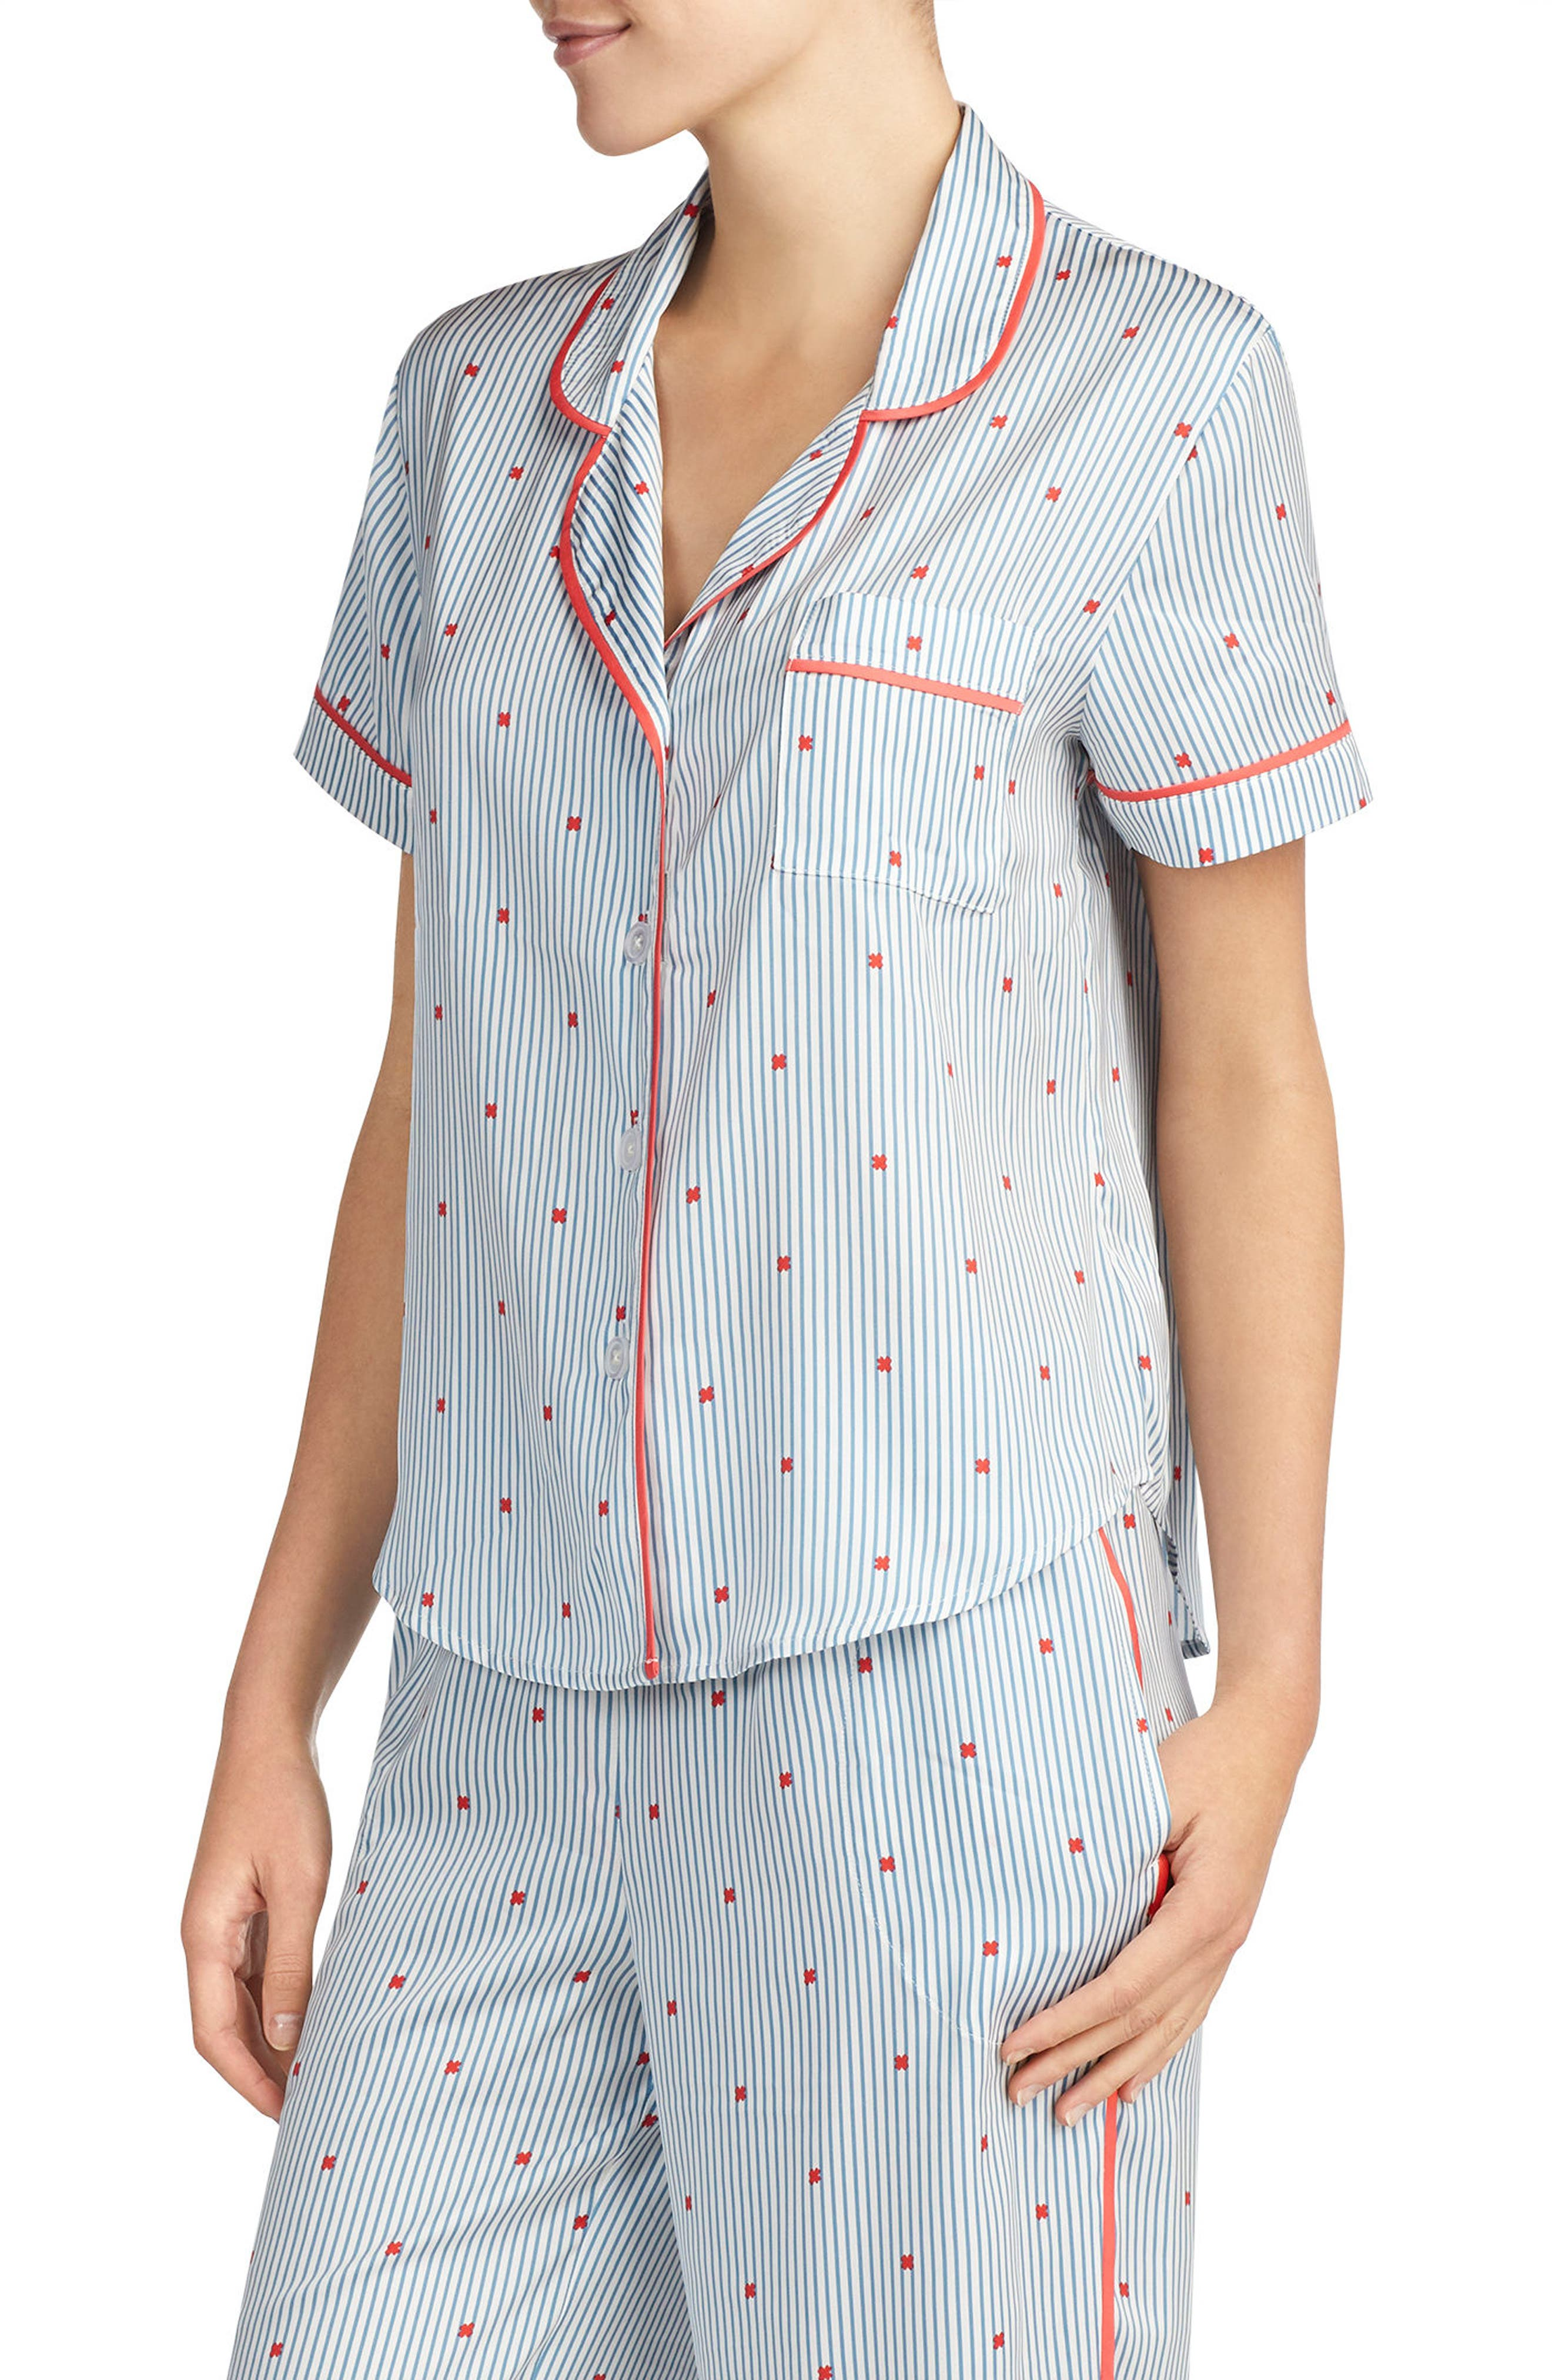 Satin Pajama Top,                             Main thumbnail 3, color,